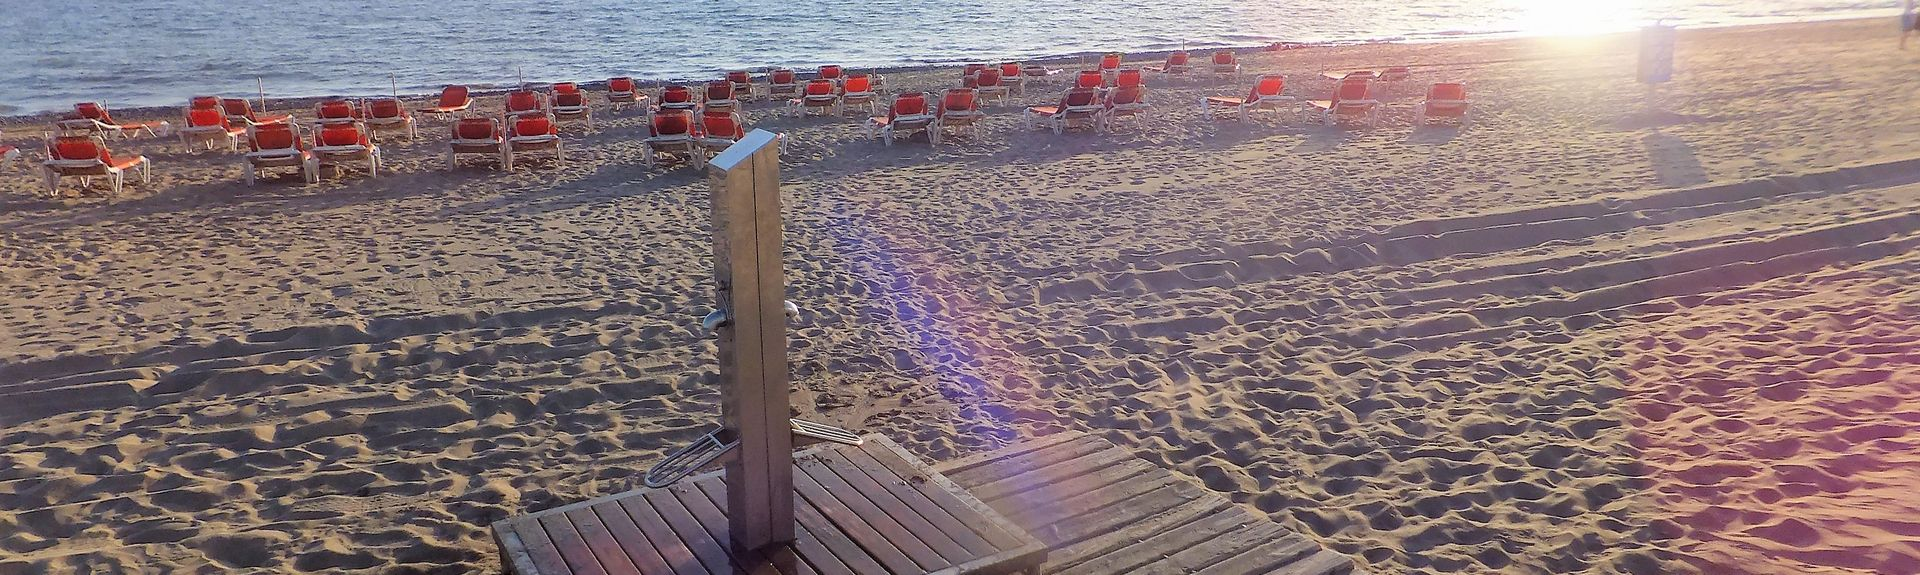 Sonnenland, Maspalomas, Kanariøyene, Spania